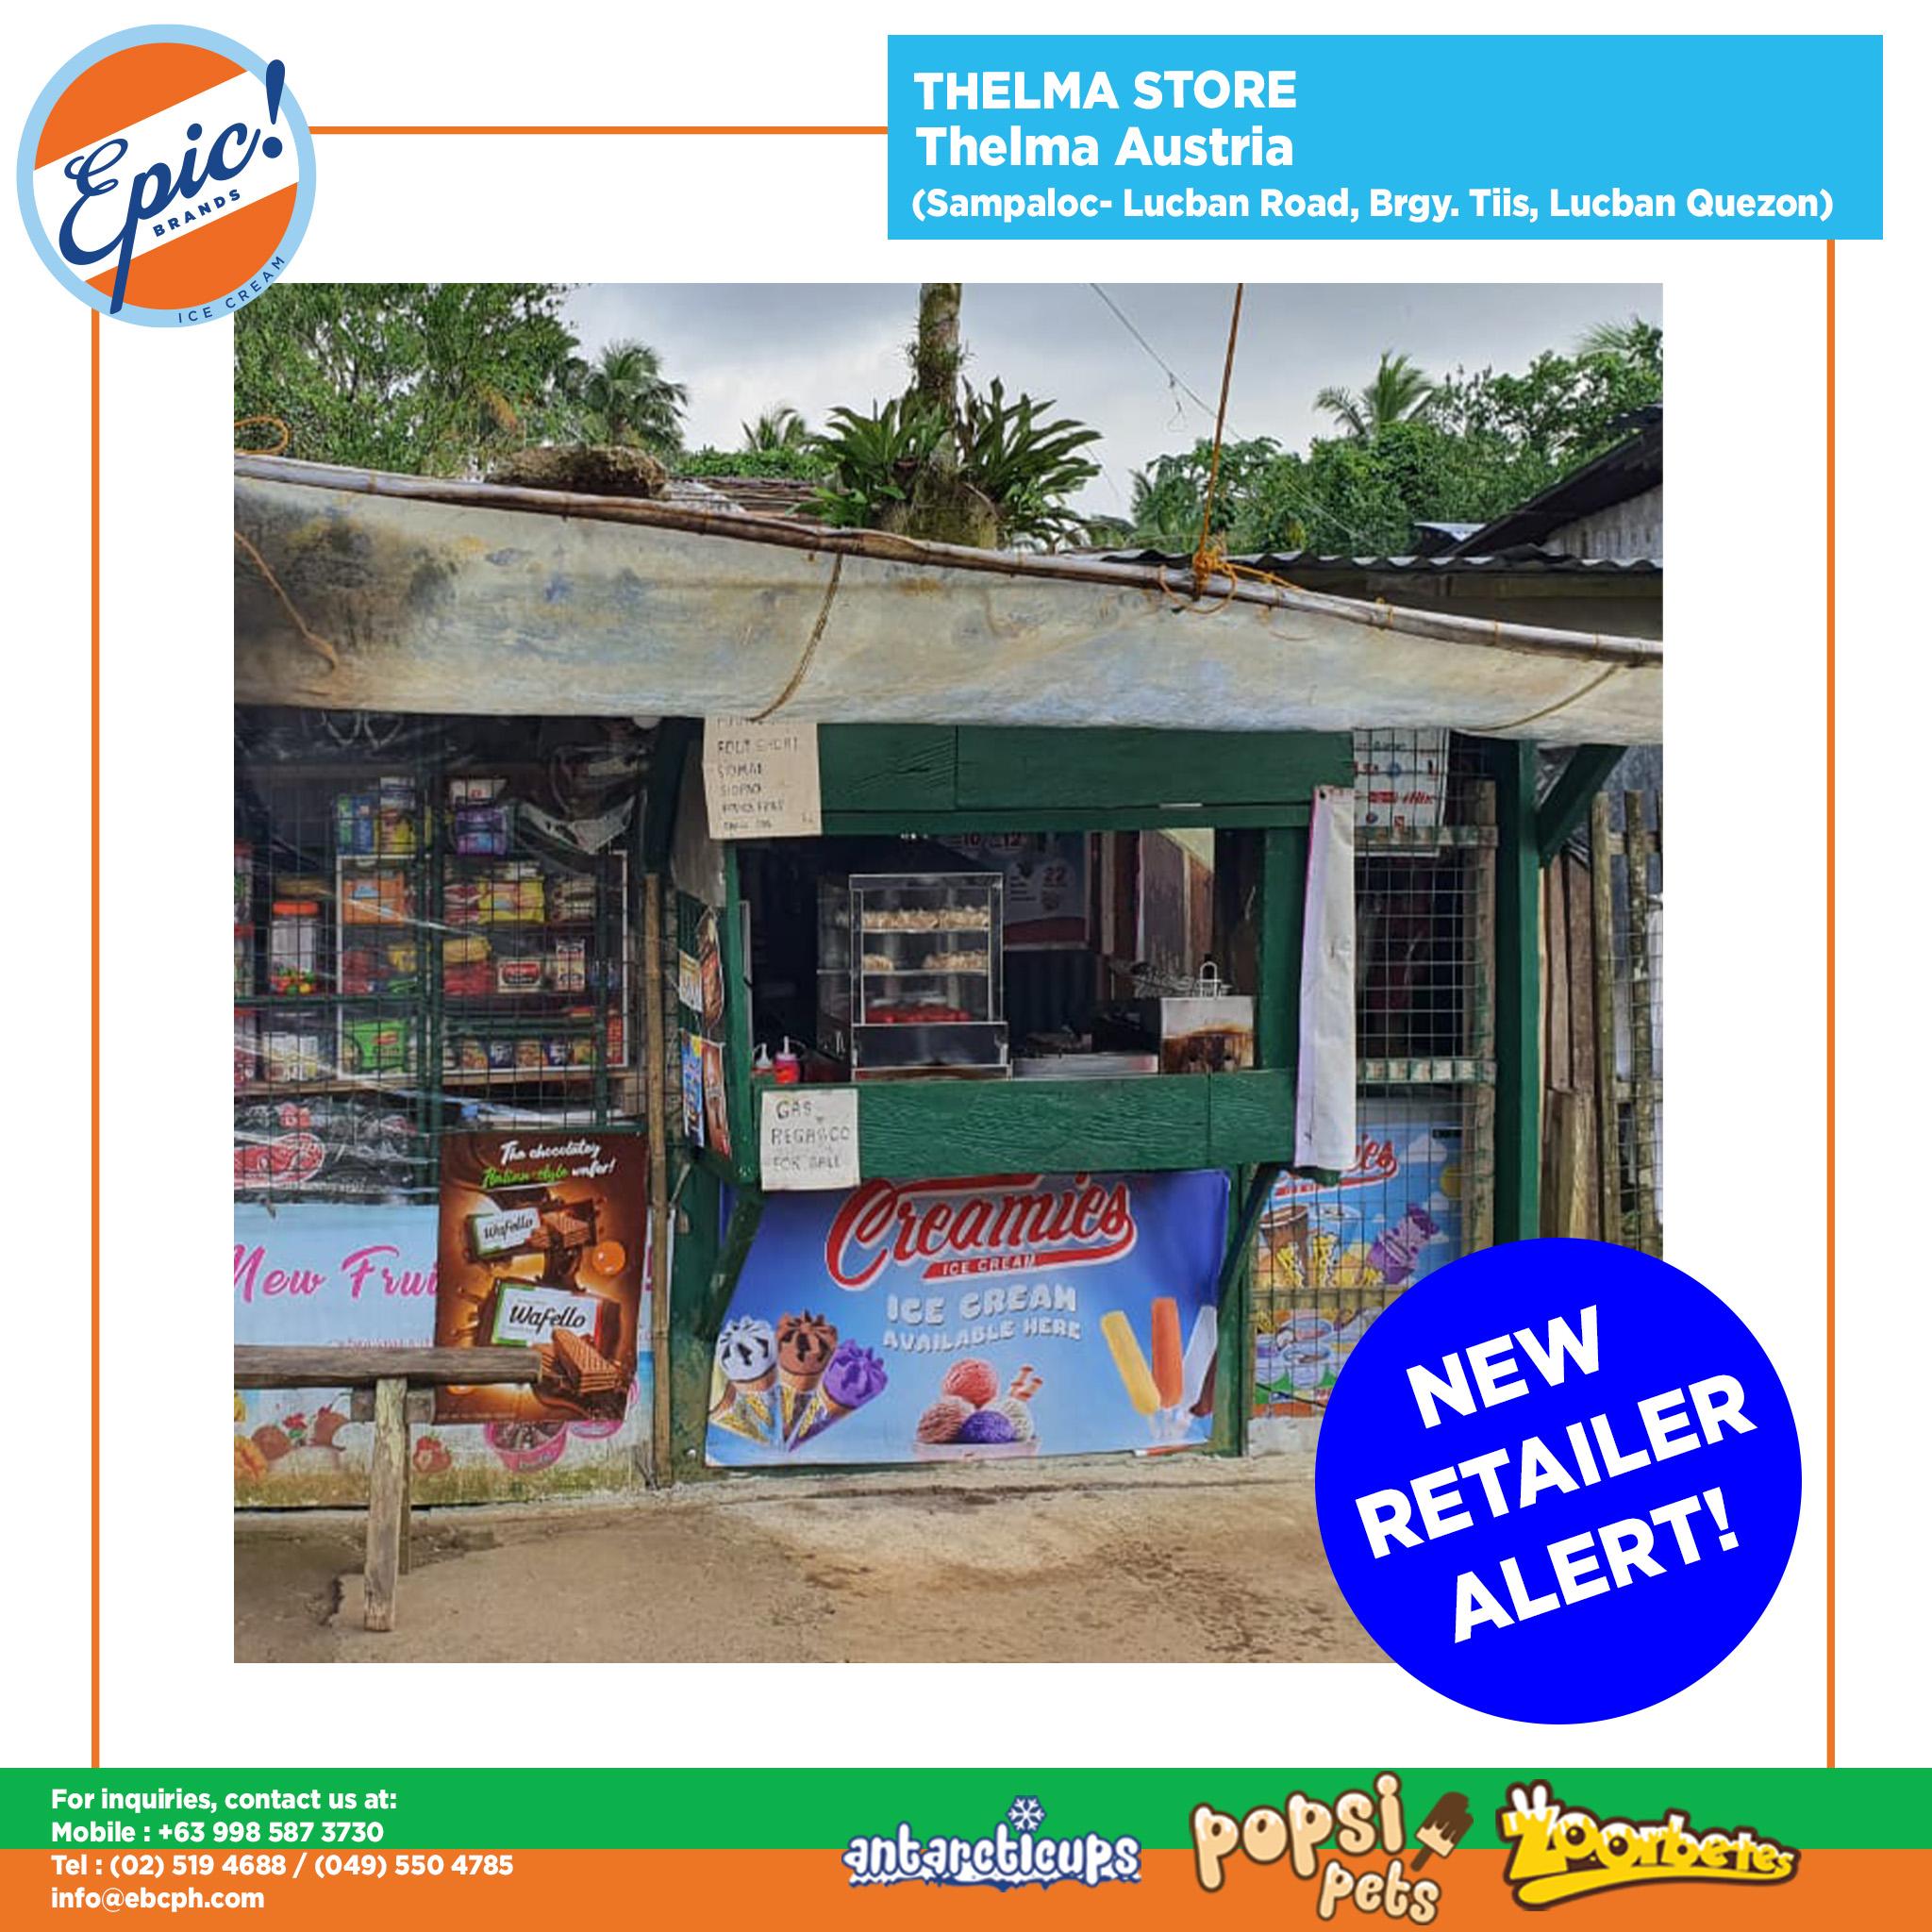 Thelma Store